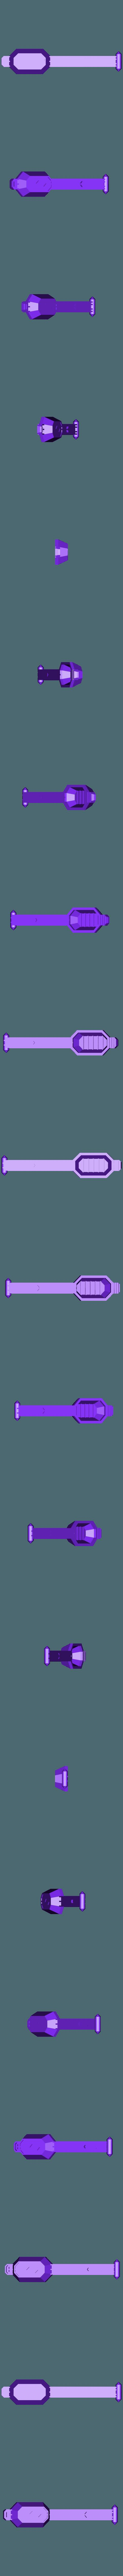 Catapult Arm.stl Download free STL file Catapult Defense • 3D print model, FerryTeacher